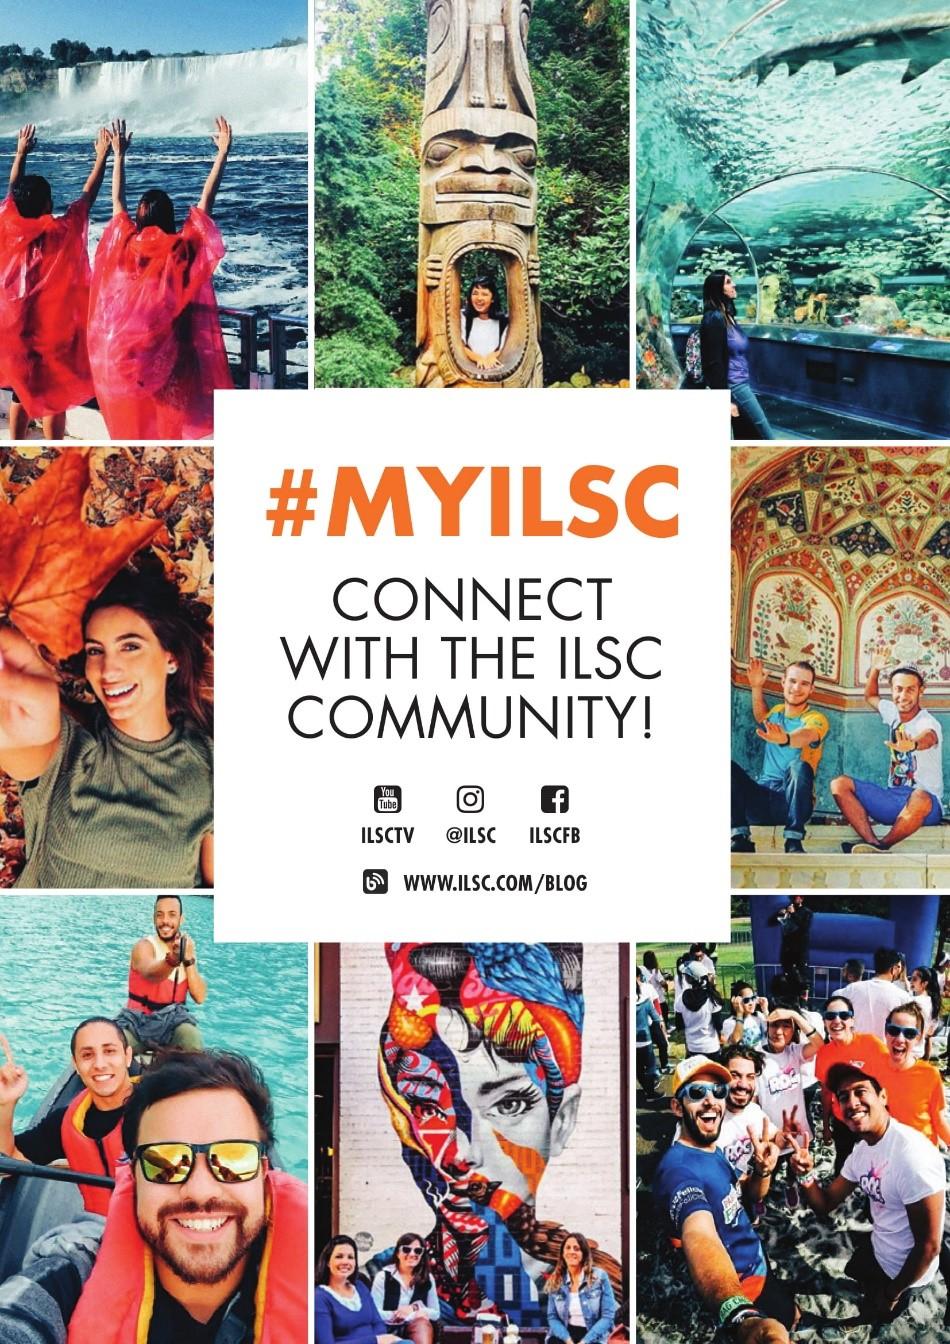 My ILSC Connect